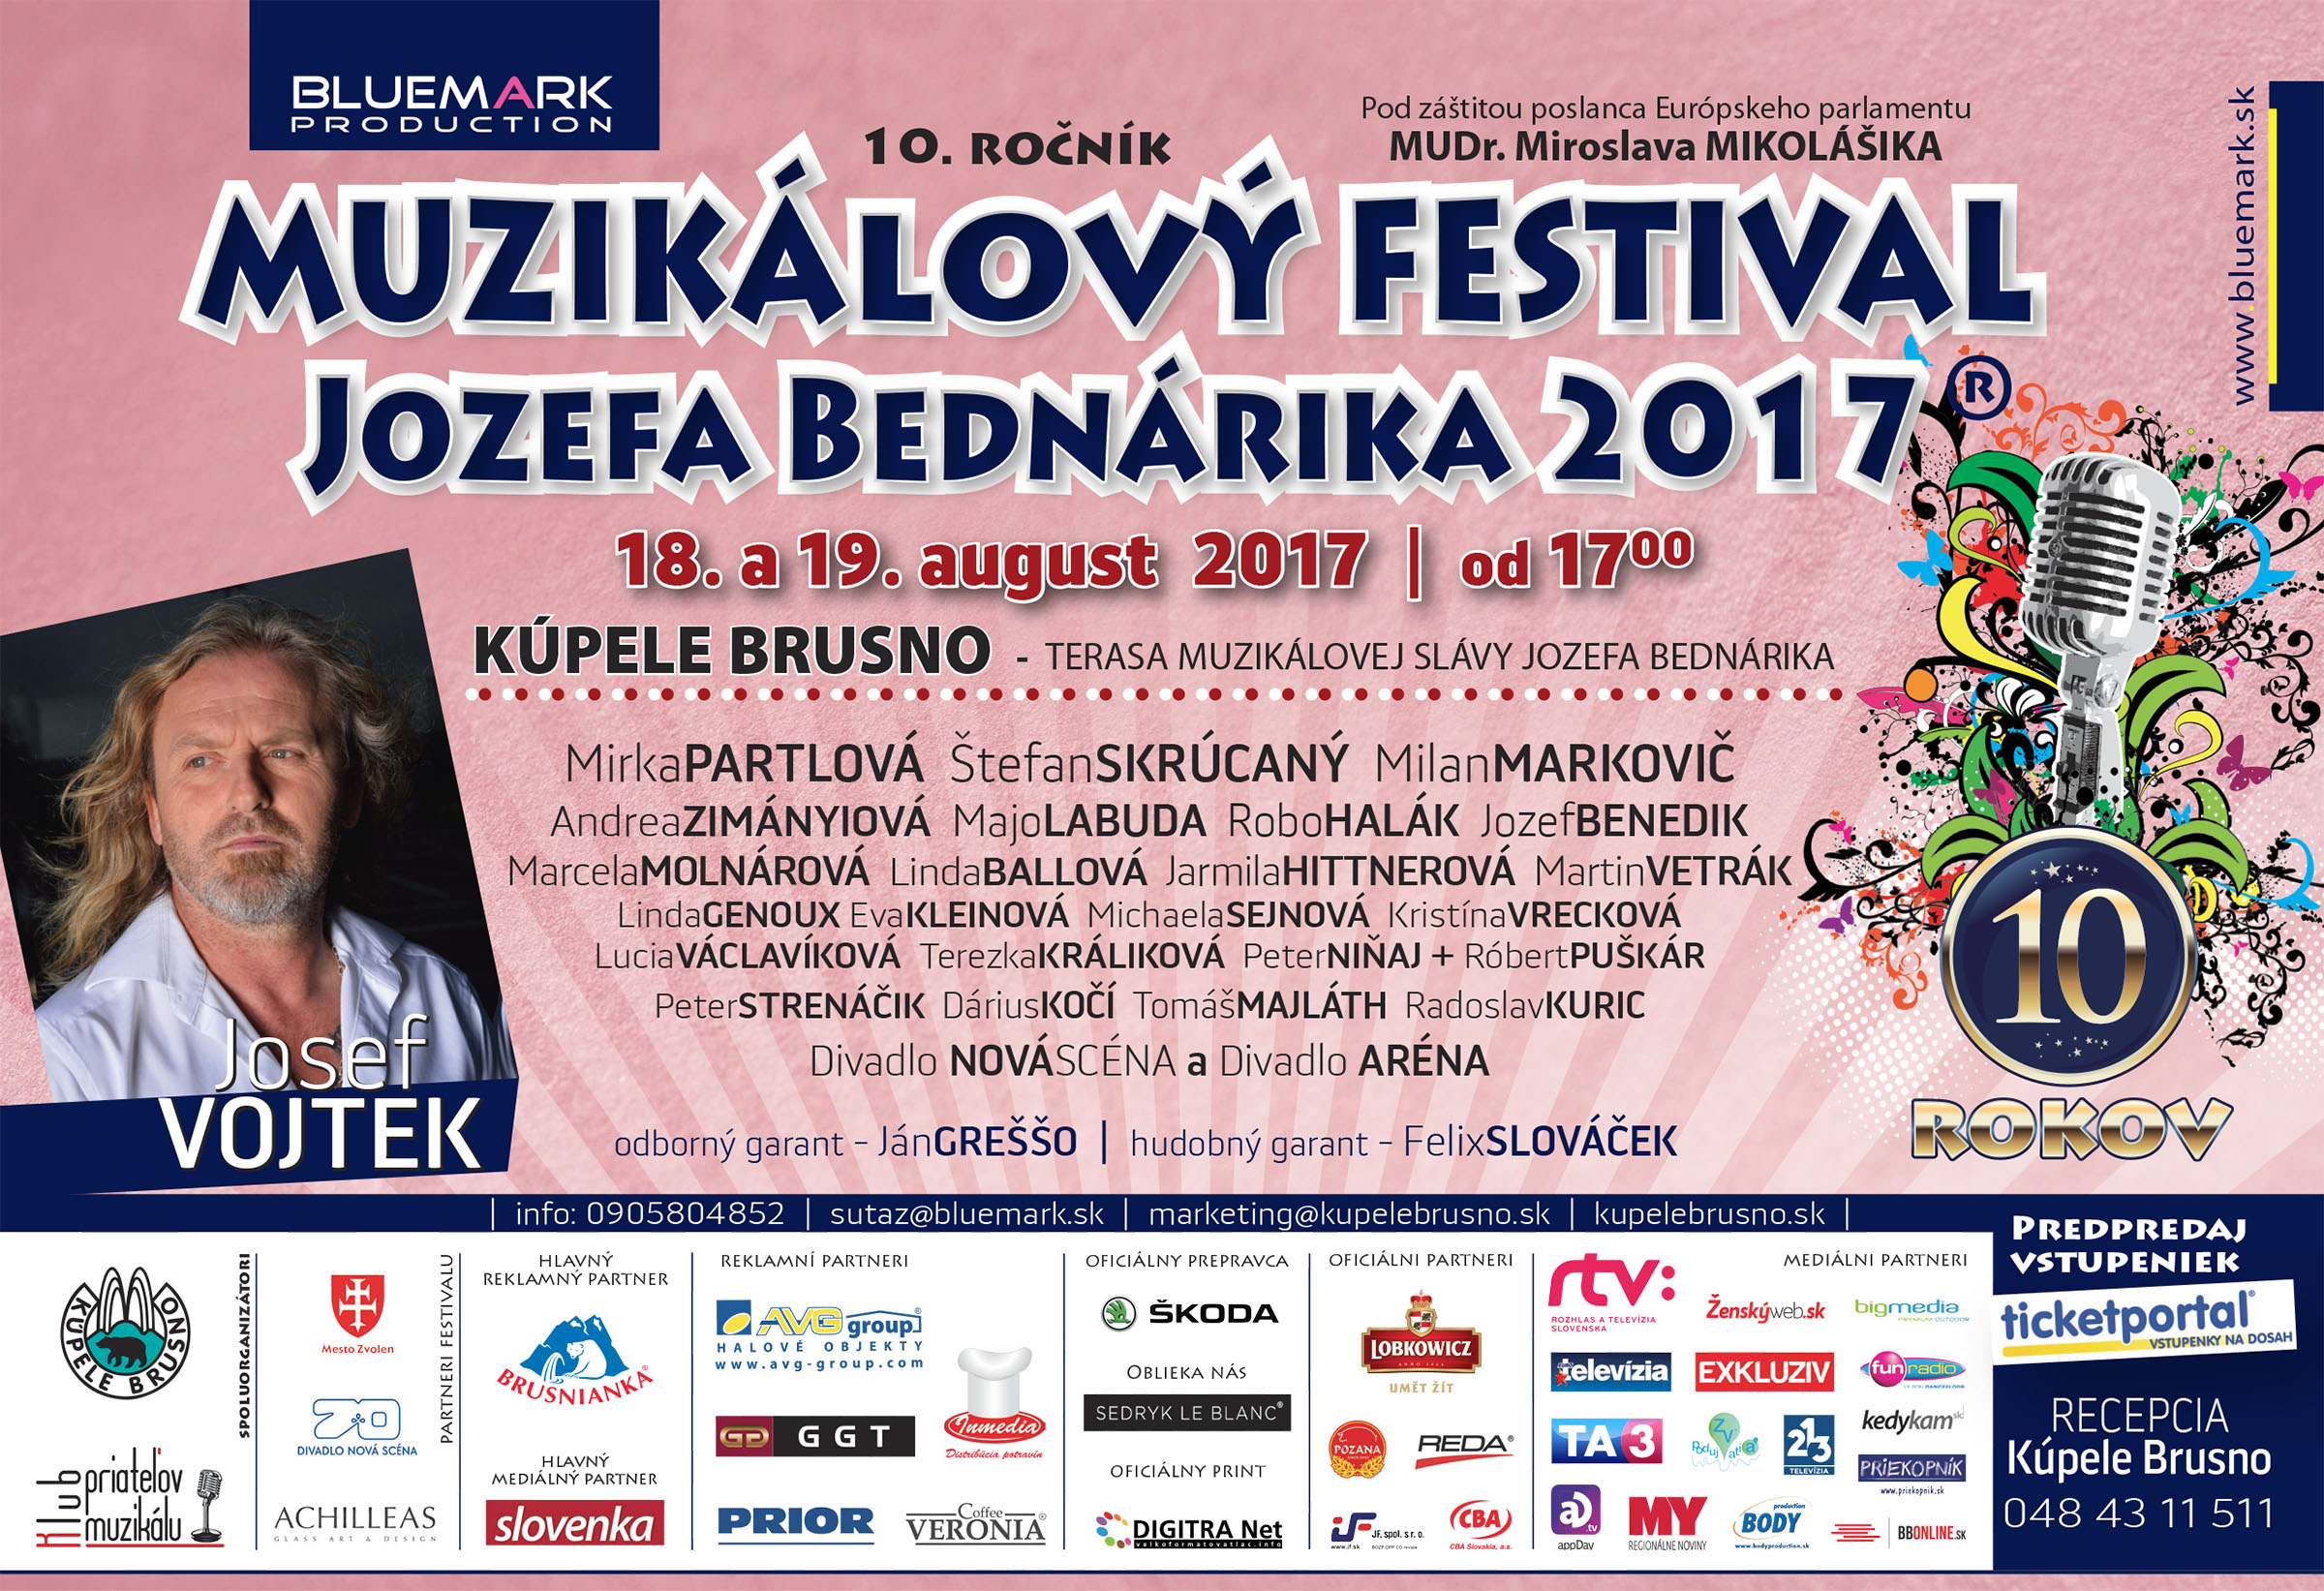 muzikalovy-festival-j-bednarika-plagat-2017